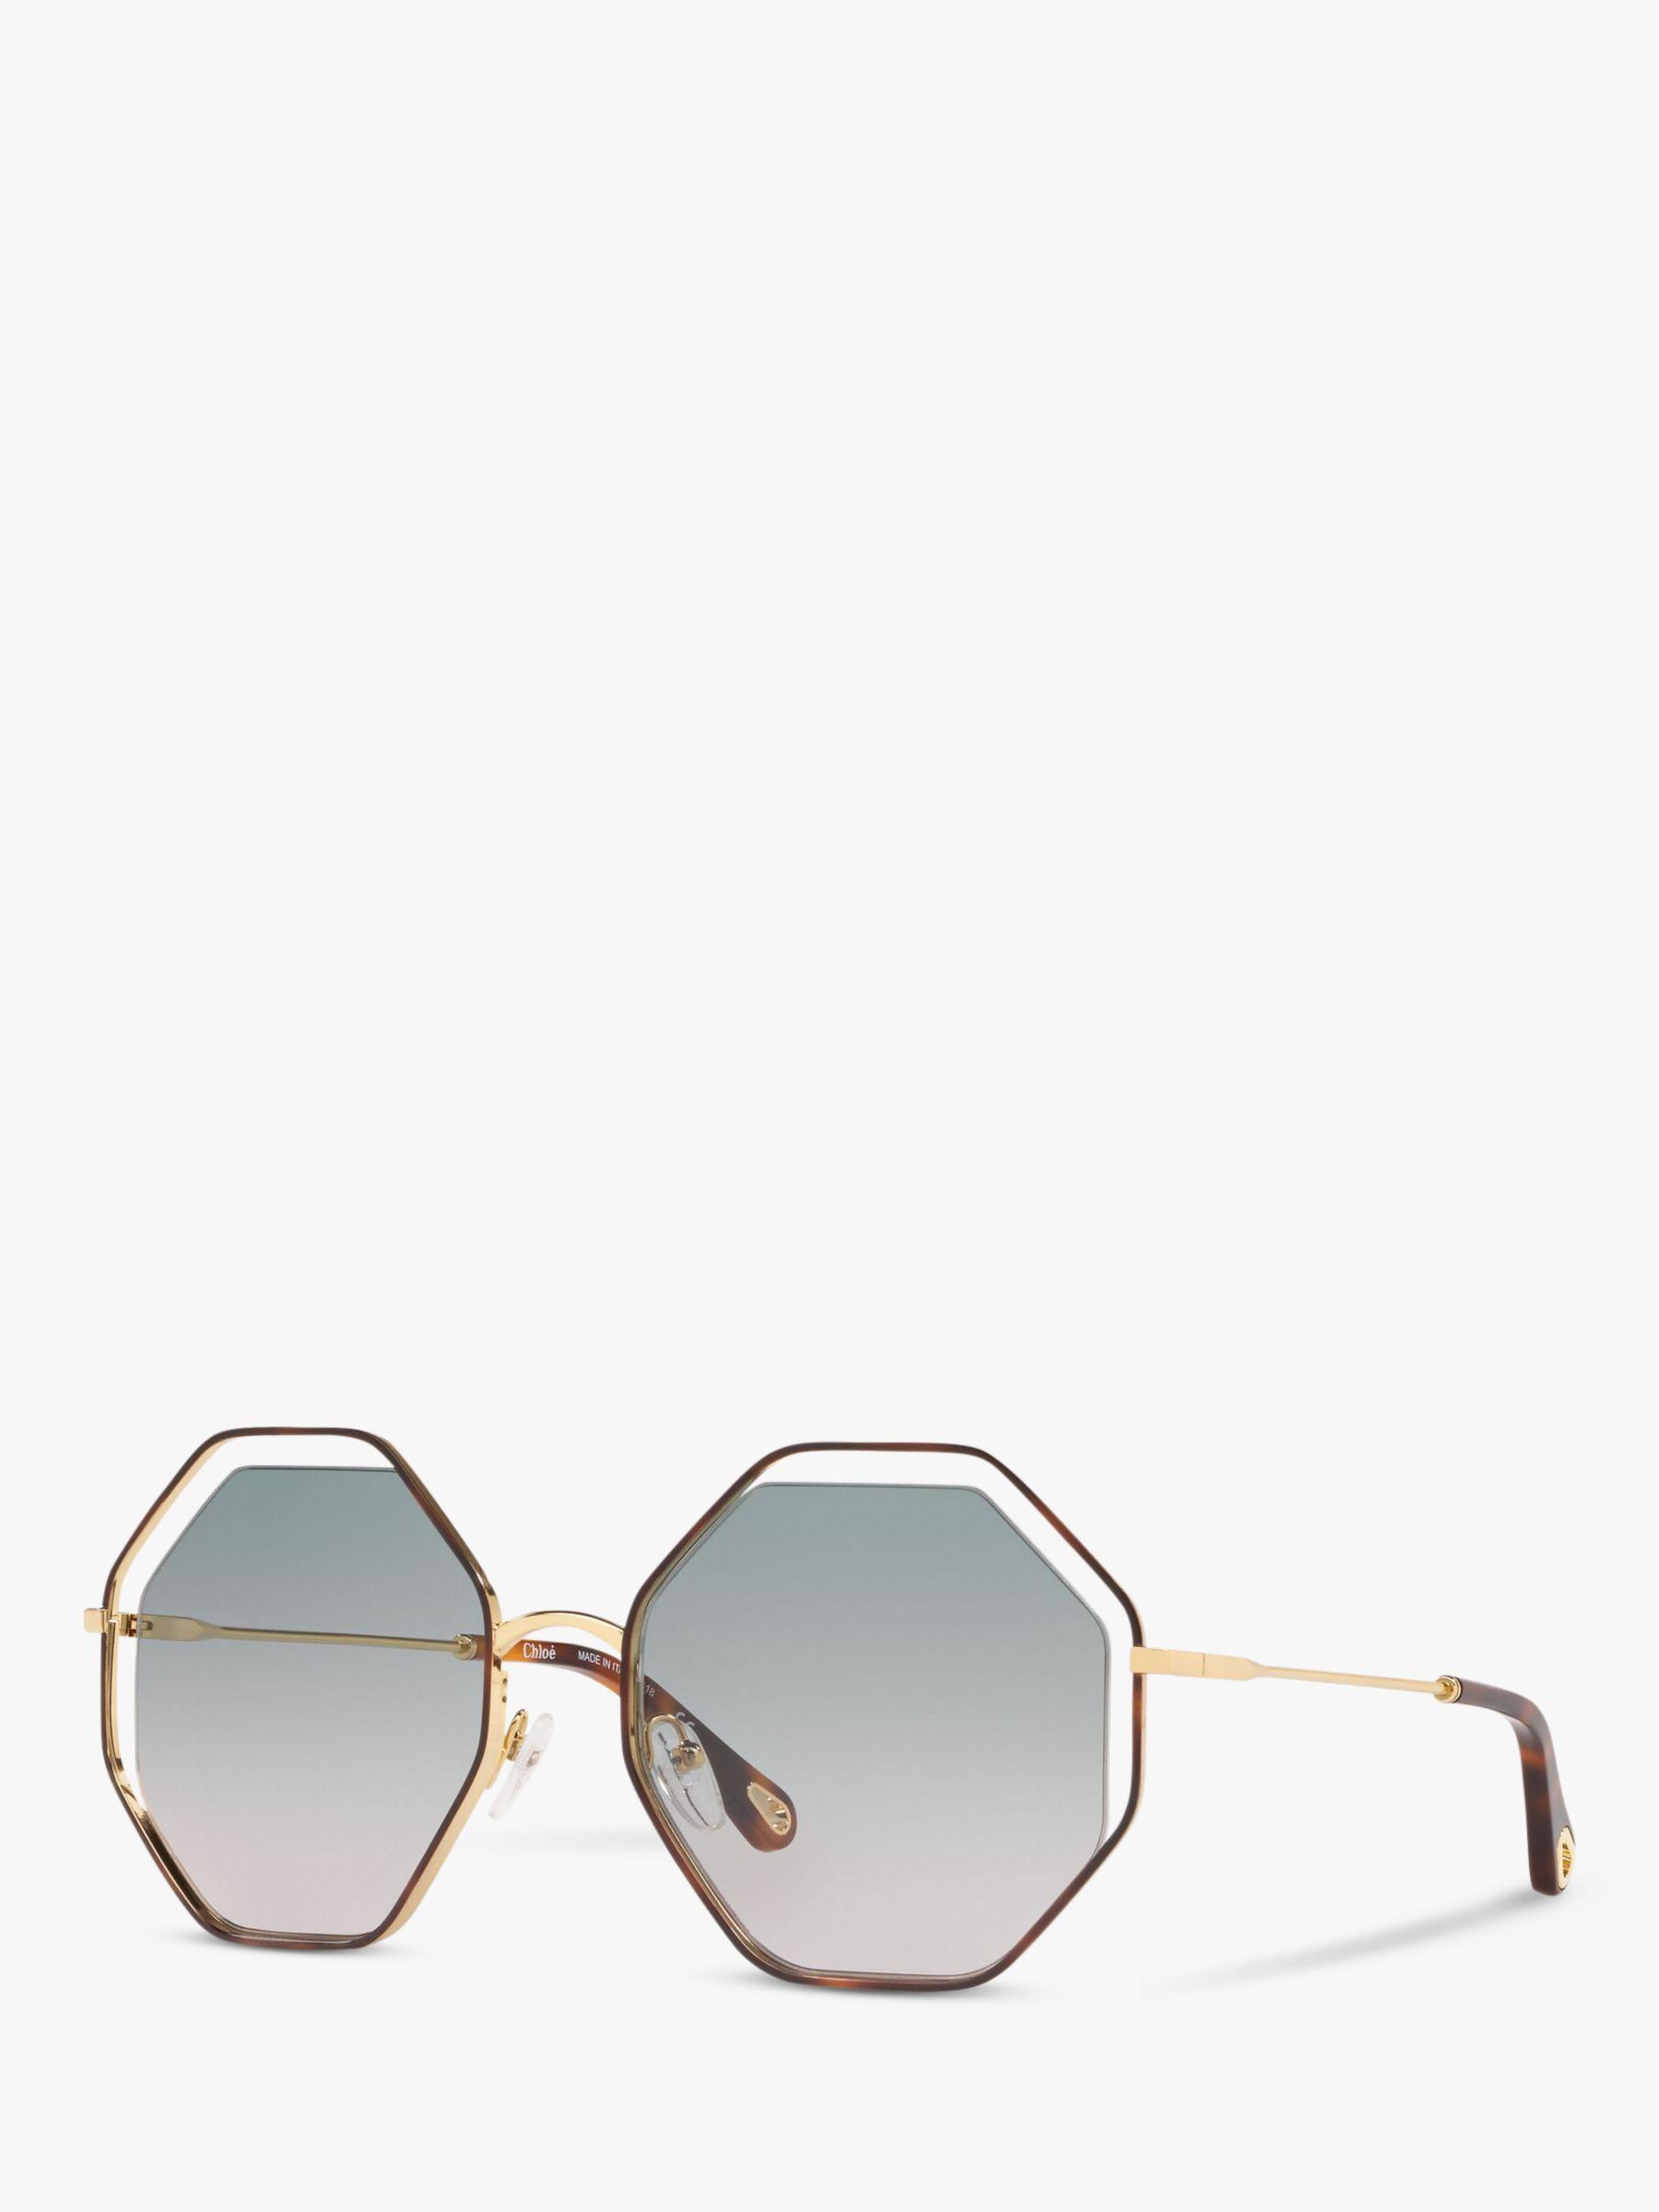 Chloe Chloé CE132S Women's Octagonal Sunglasses, Brown/Green